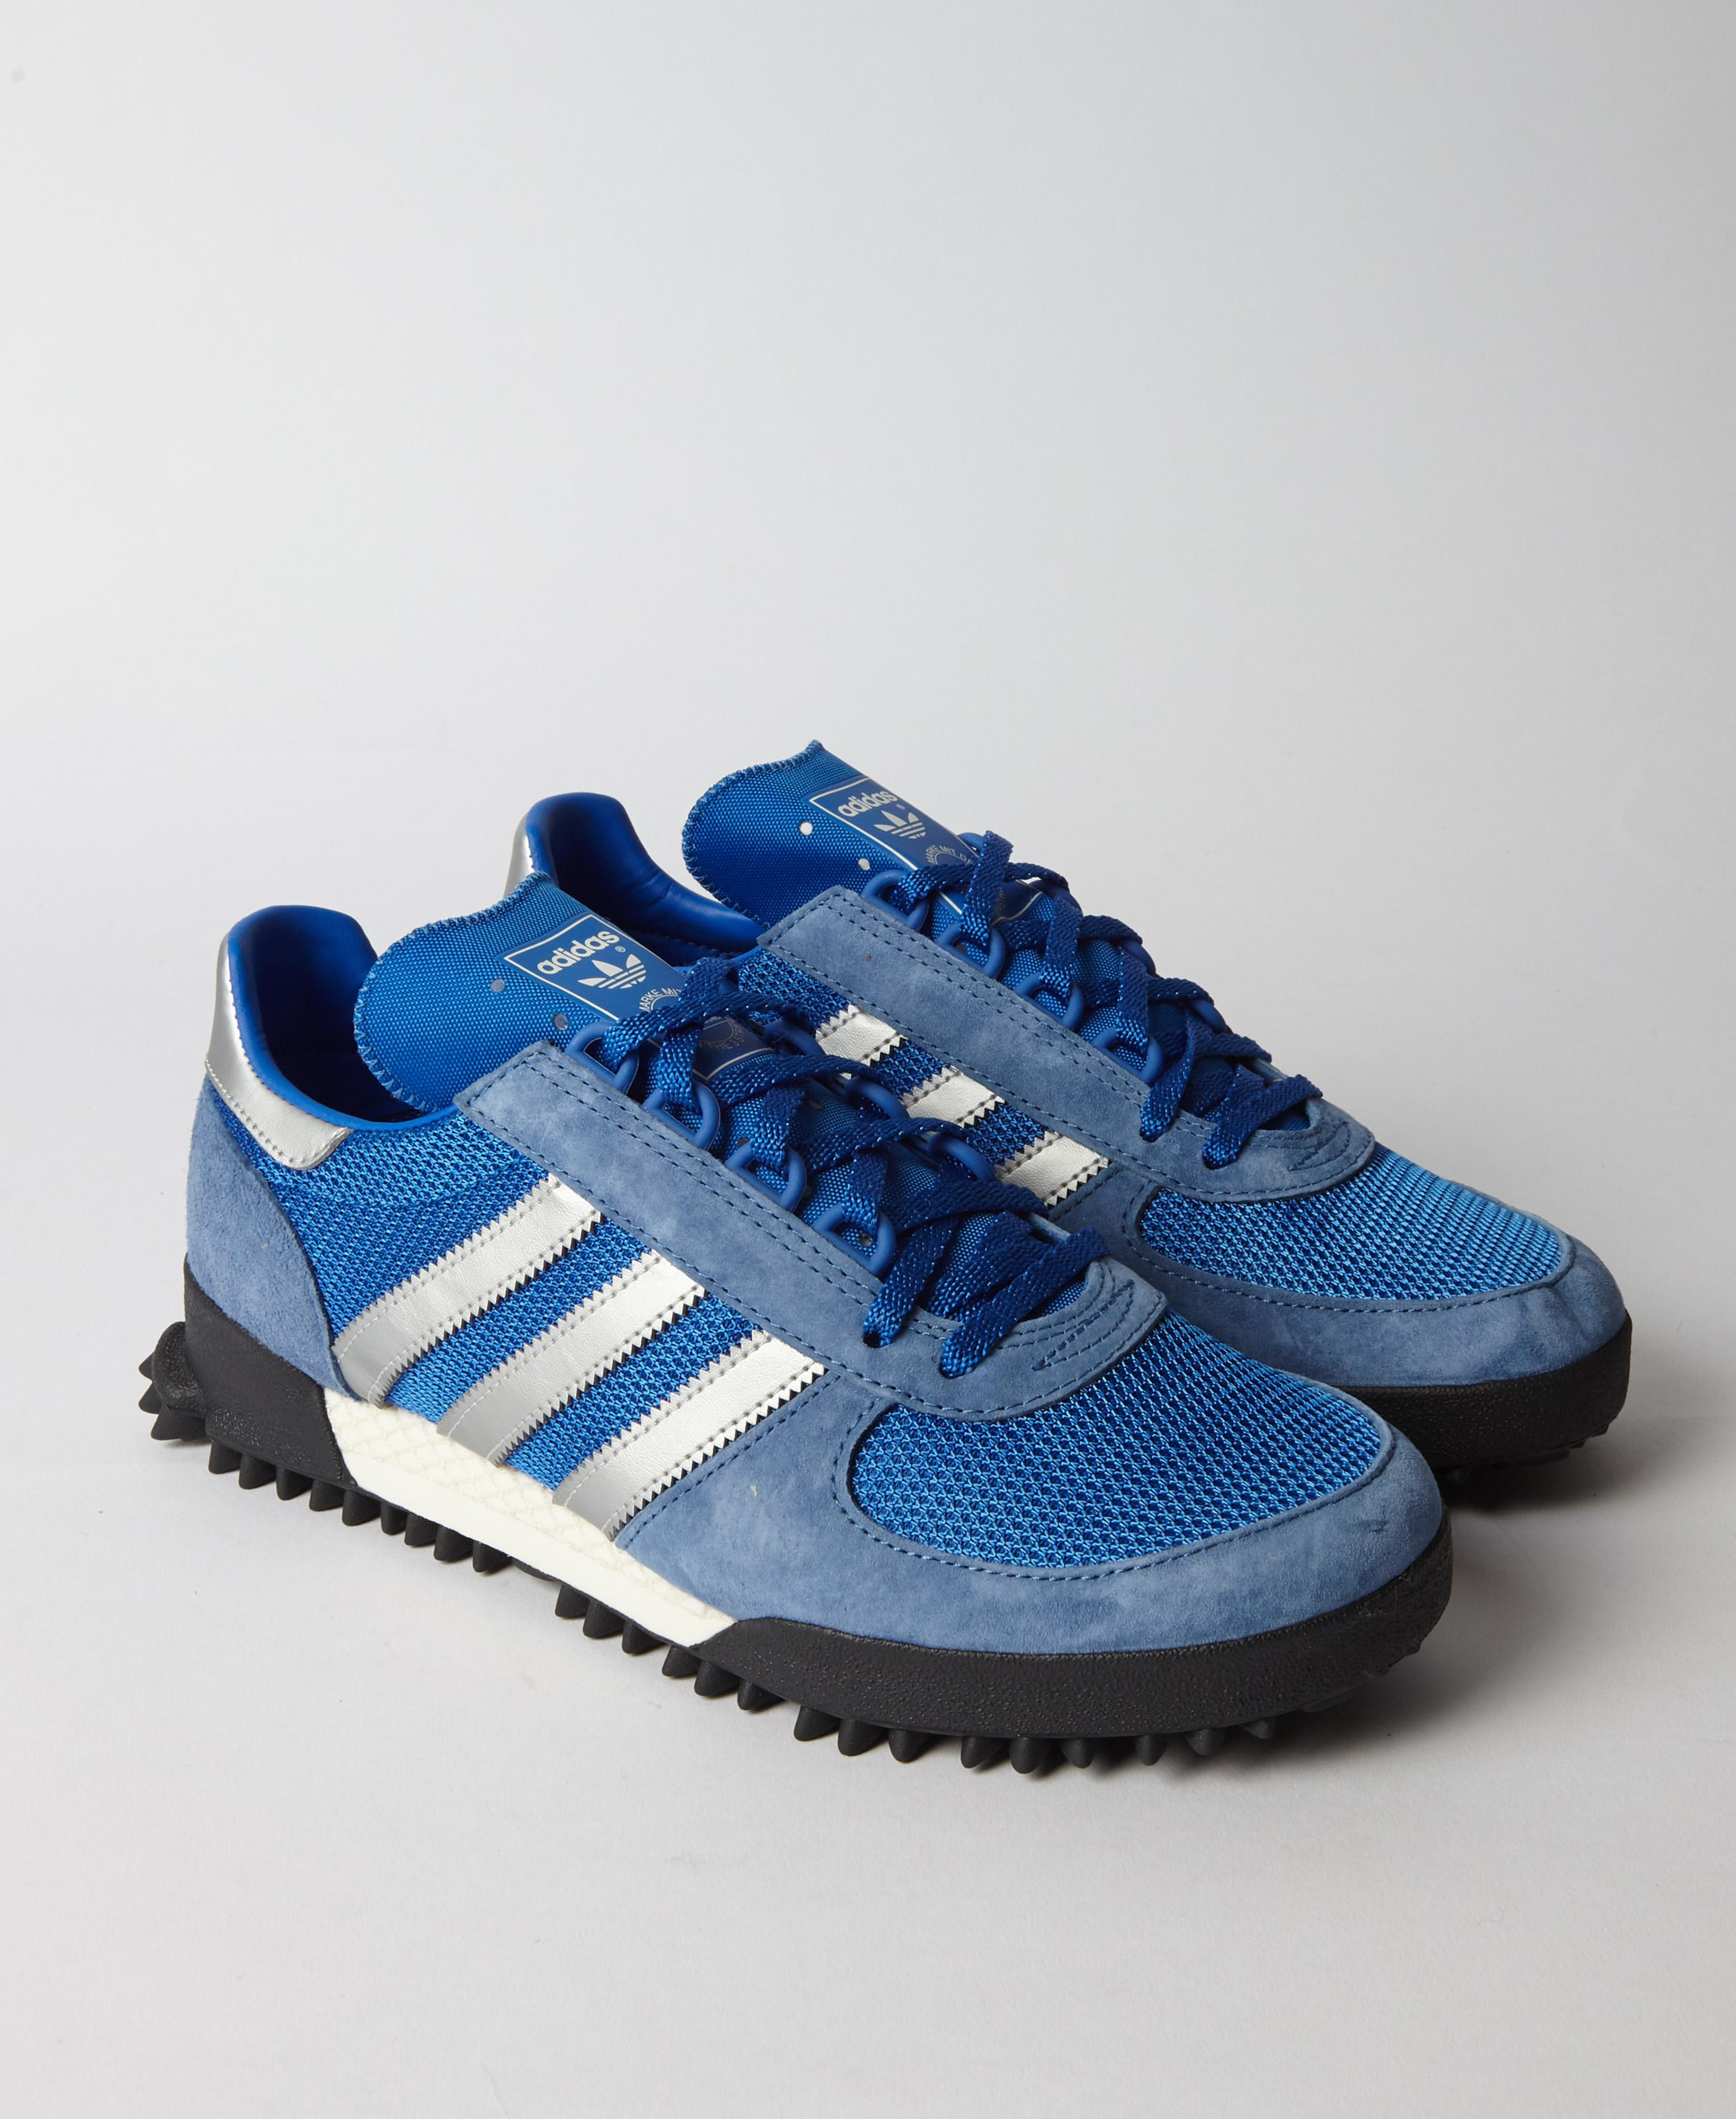 Lyst - adidas Marathon Tr Vintage in Blue for Men ae675985c